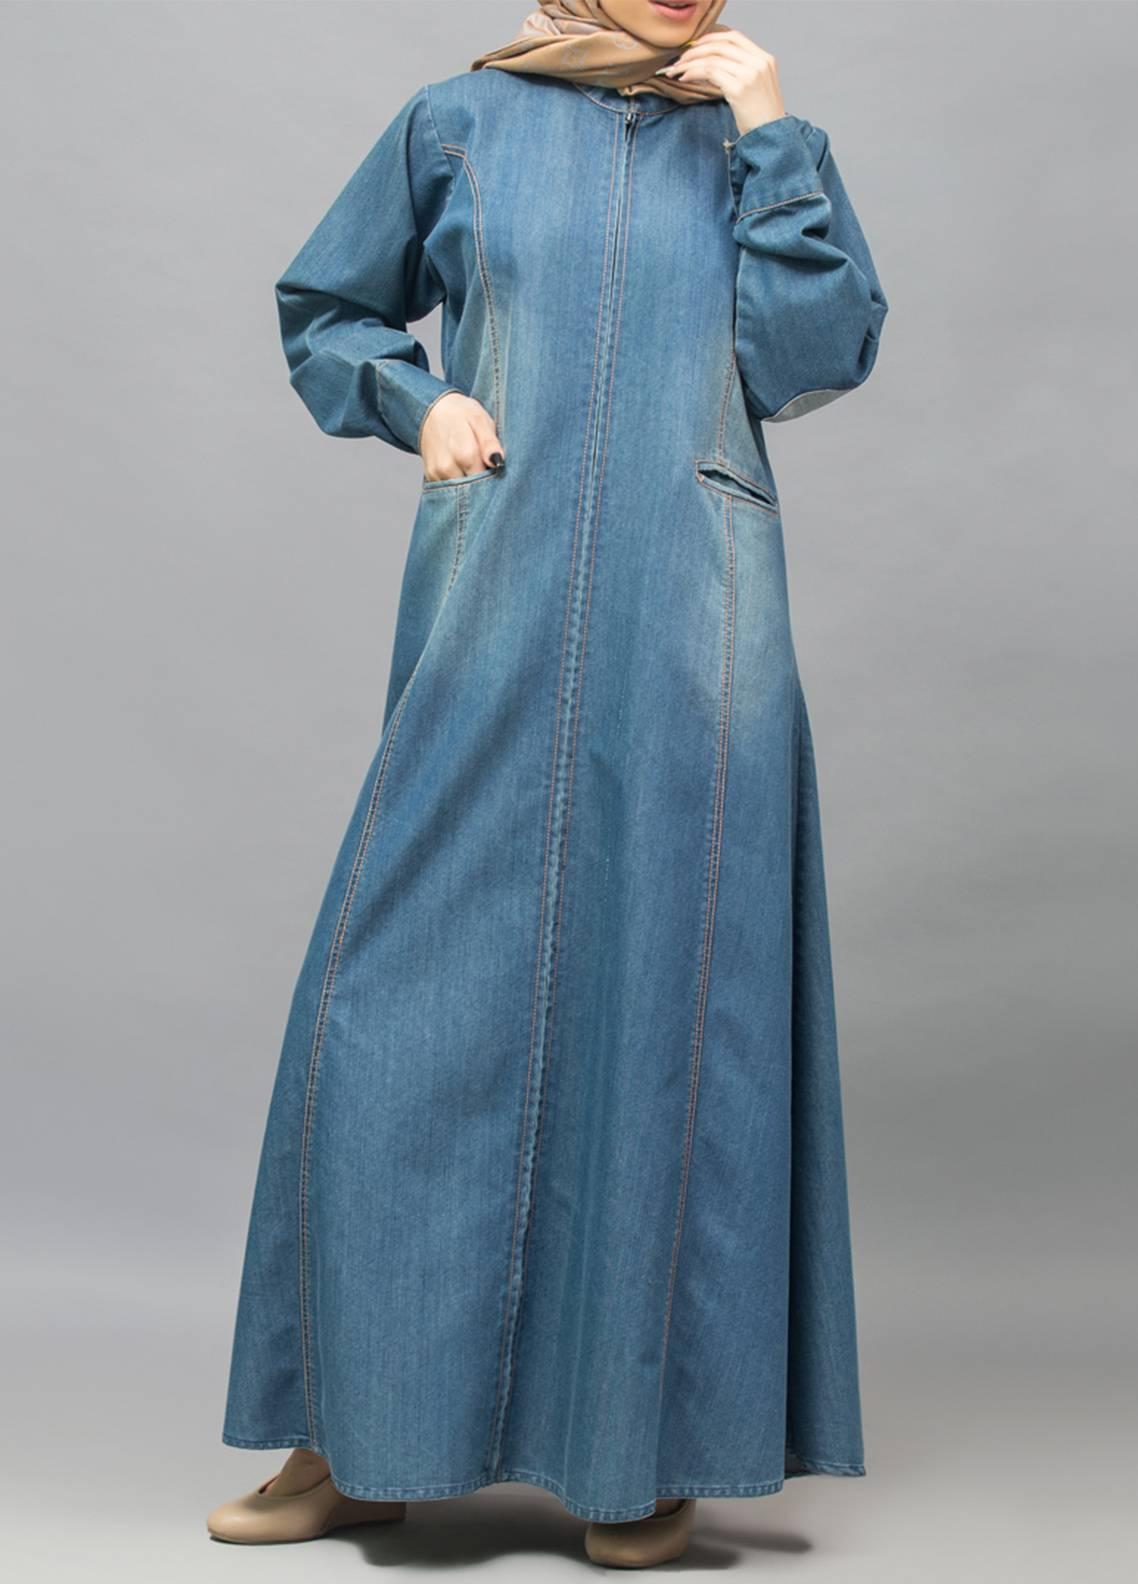 Hijab ul Hareem Front Open Style Stitched Abaya 0118-R-987